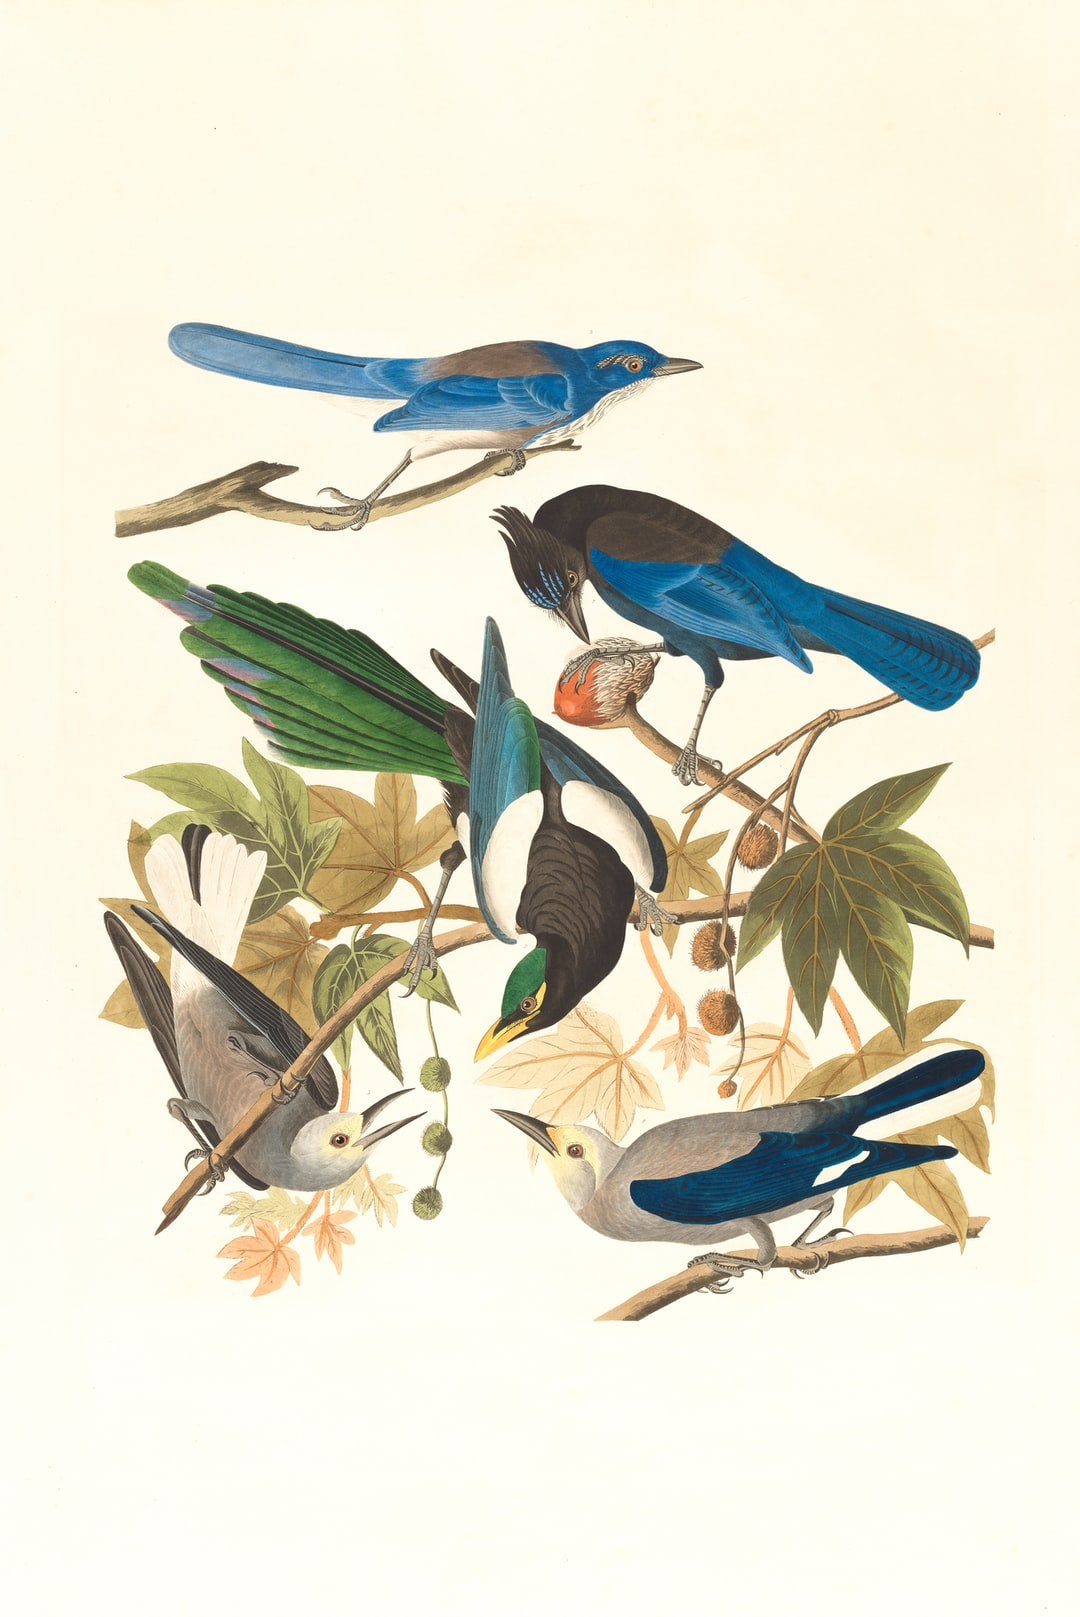 Yellow-billed magpie, Stellers jay, Ultramarine jay and Clark's crow. Artist: Audubon, John James, 1785-1851 https://ark.digitalcommonwealth.org/ark:/50959/9s16d723n  Please visit Digital Commonwealth to view more images: https://www.digitalcommonwealth.org.